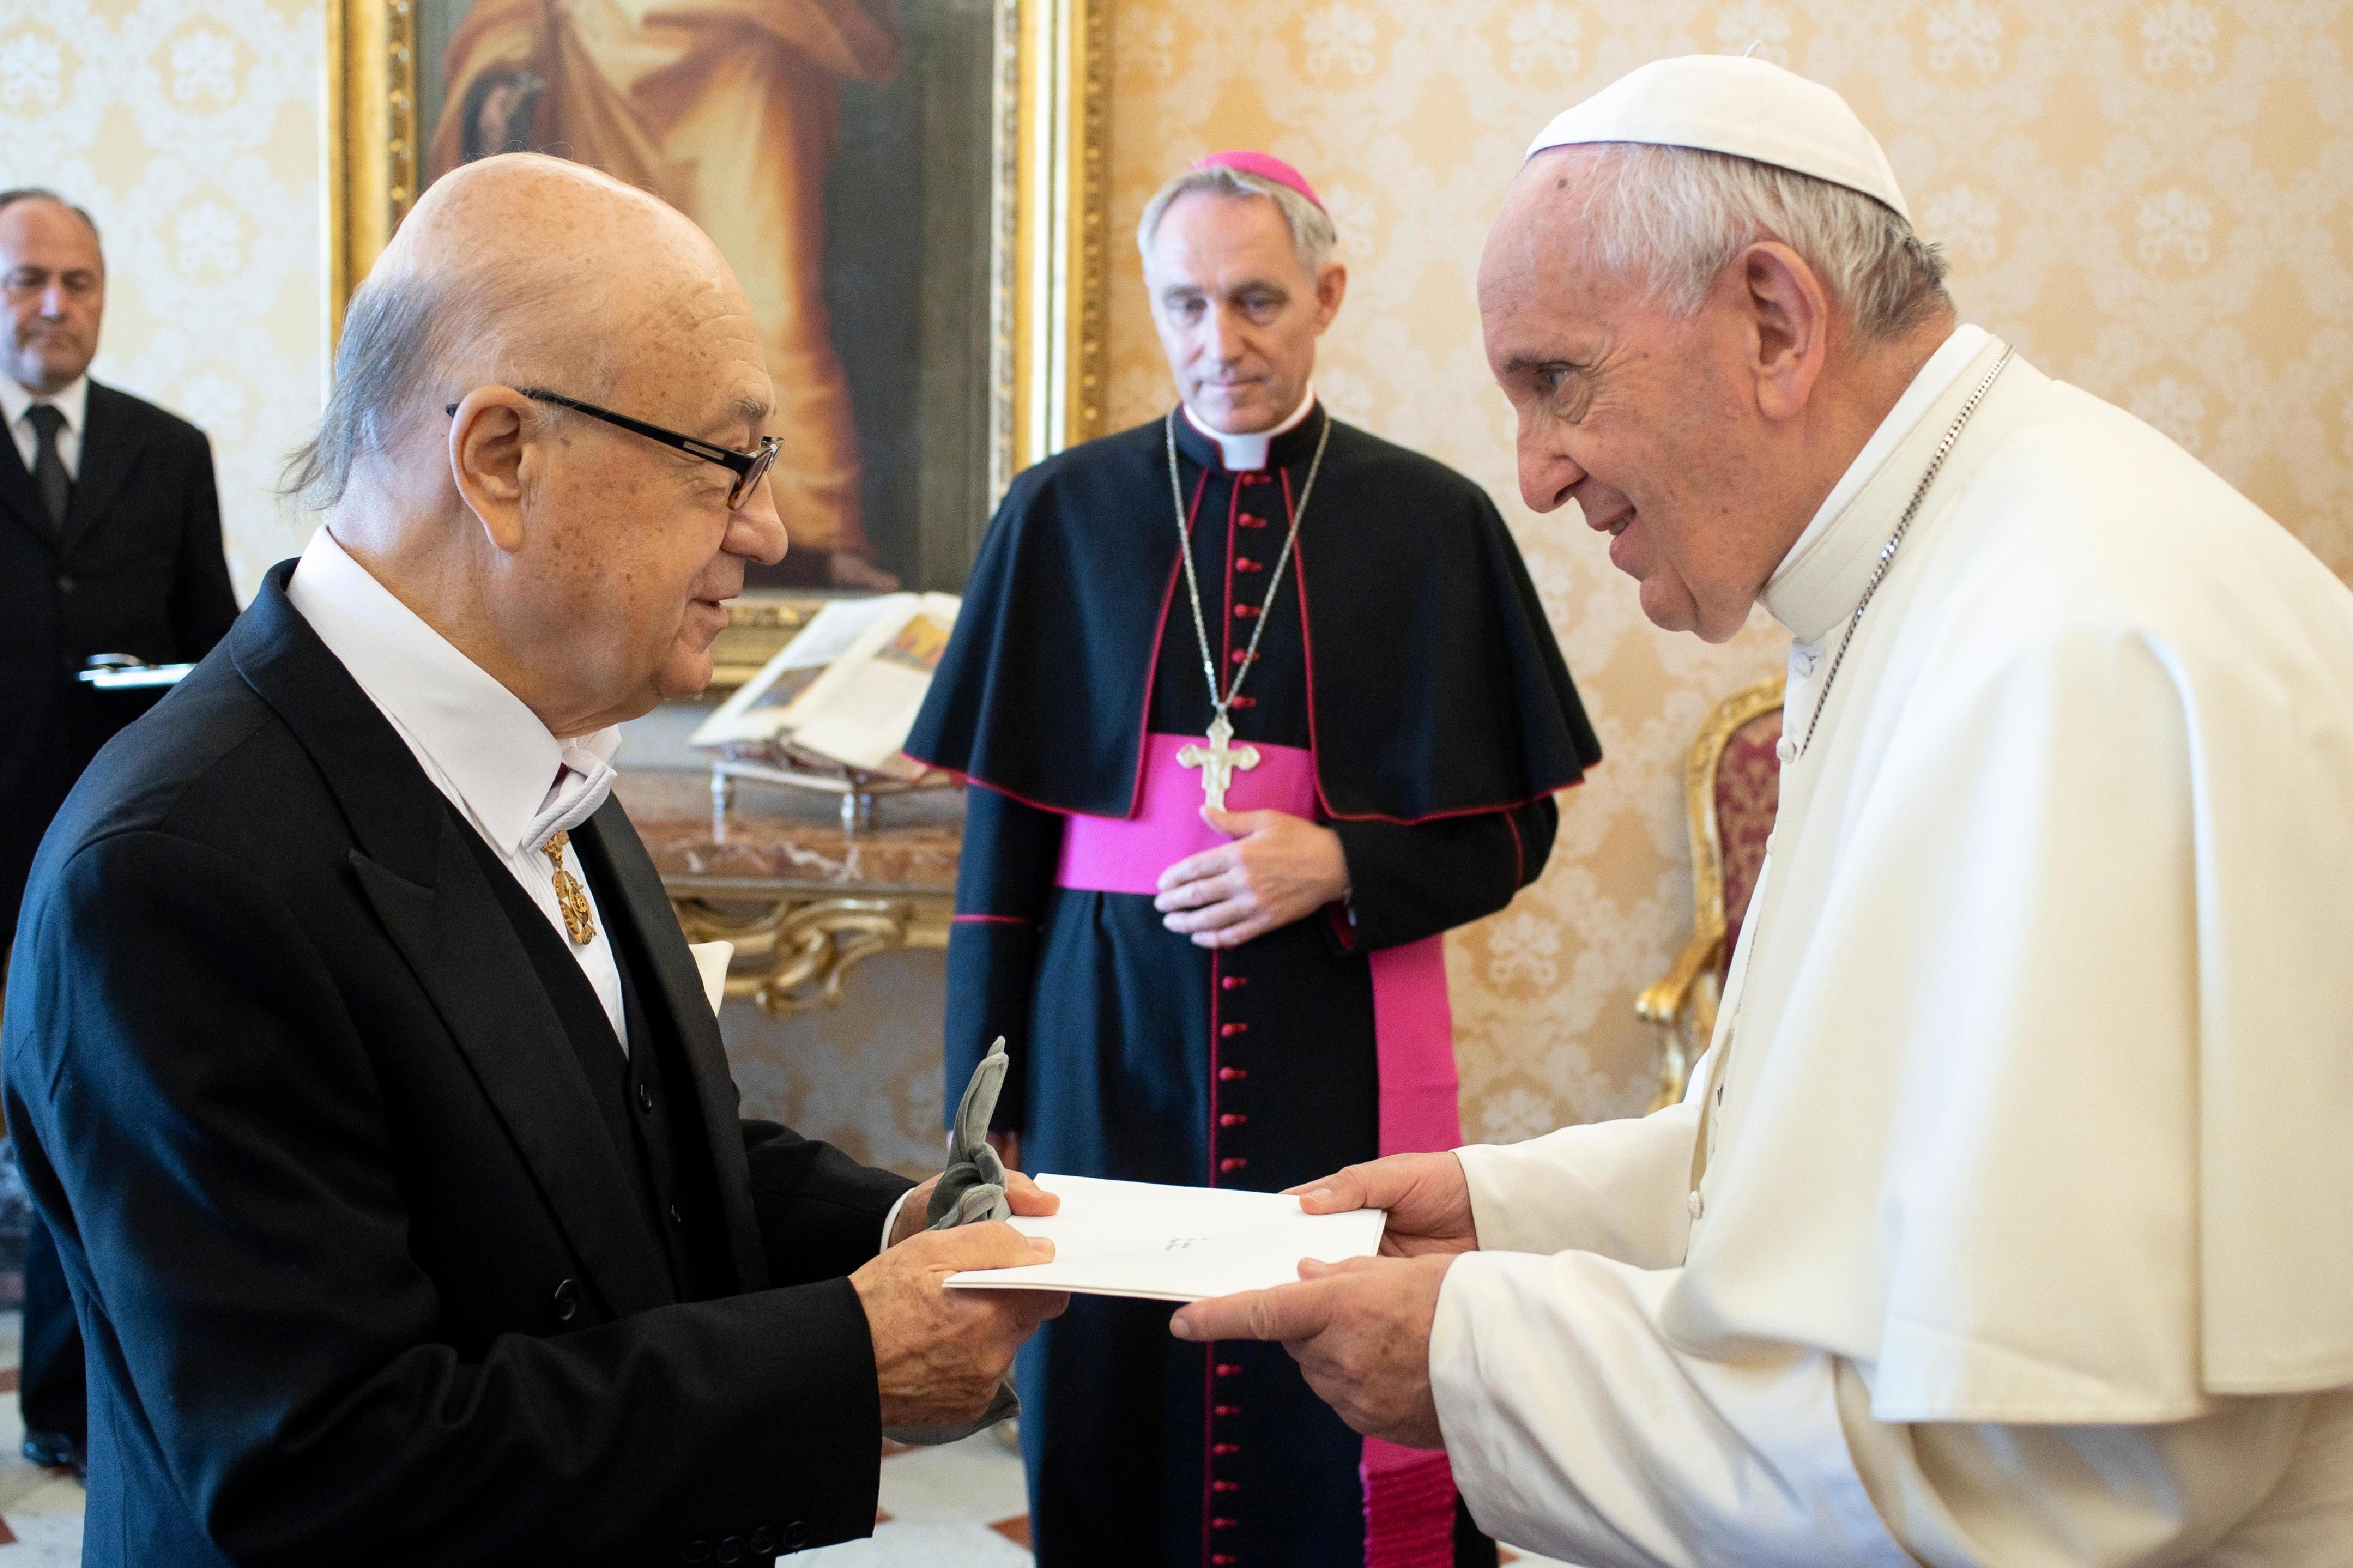 M. Octavio Errázuriz Guilisasti, ambassadeur du Chili, 17 sept. 2018 © Vatican Media